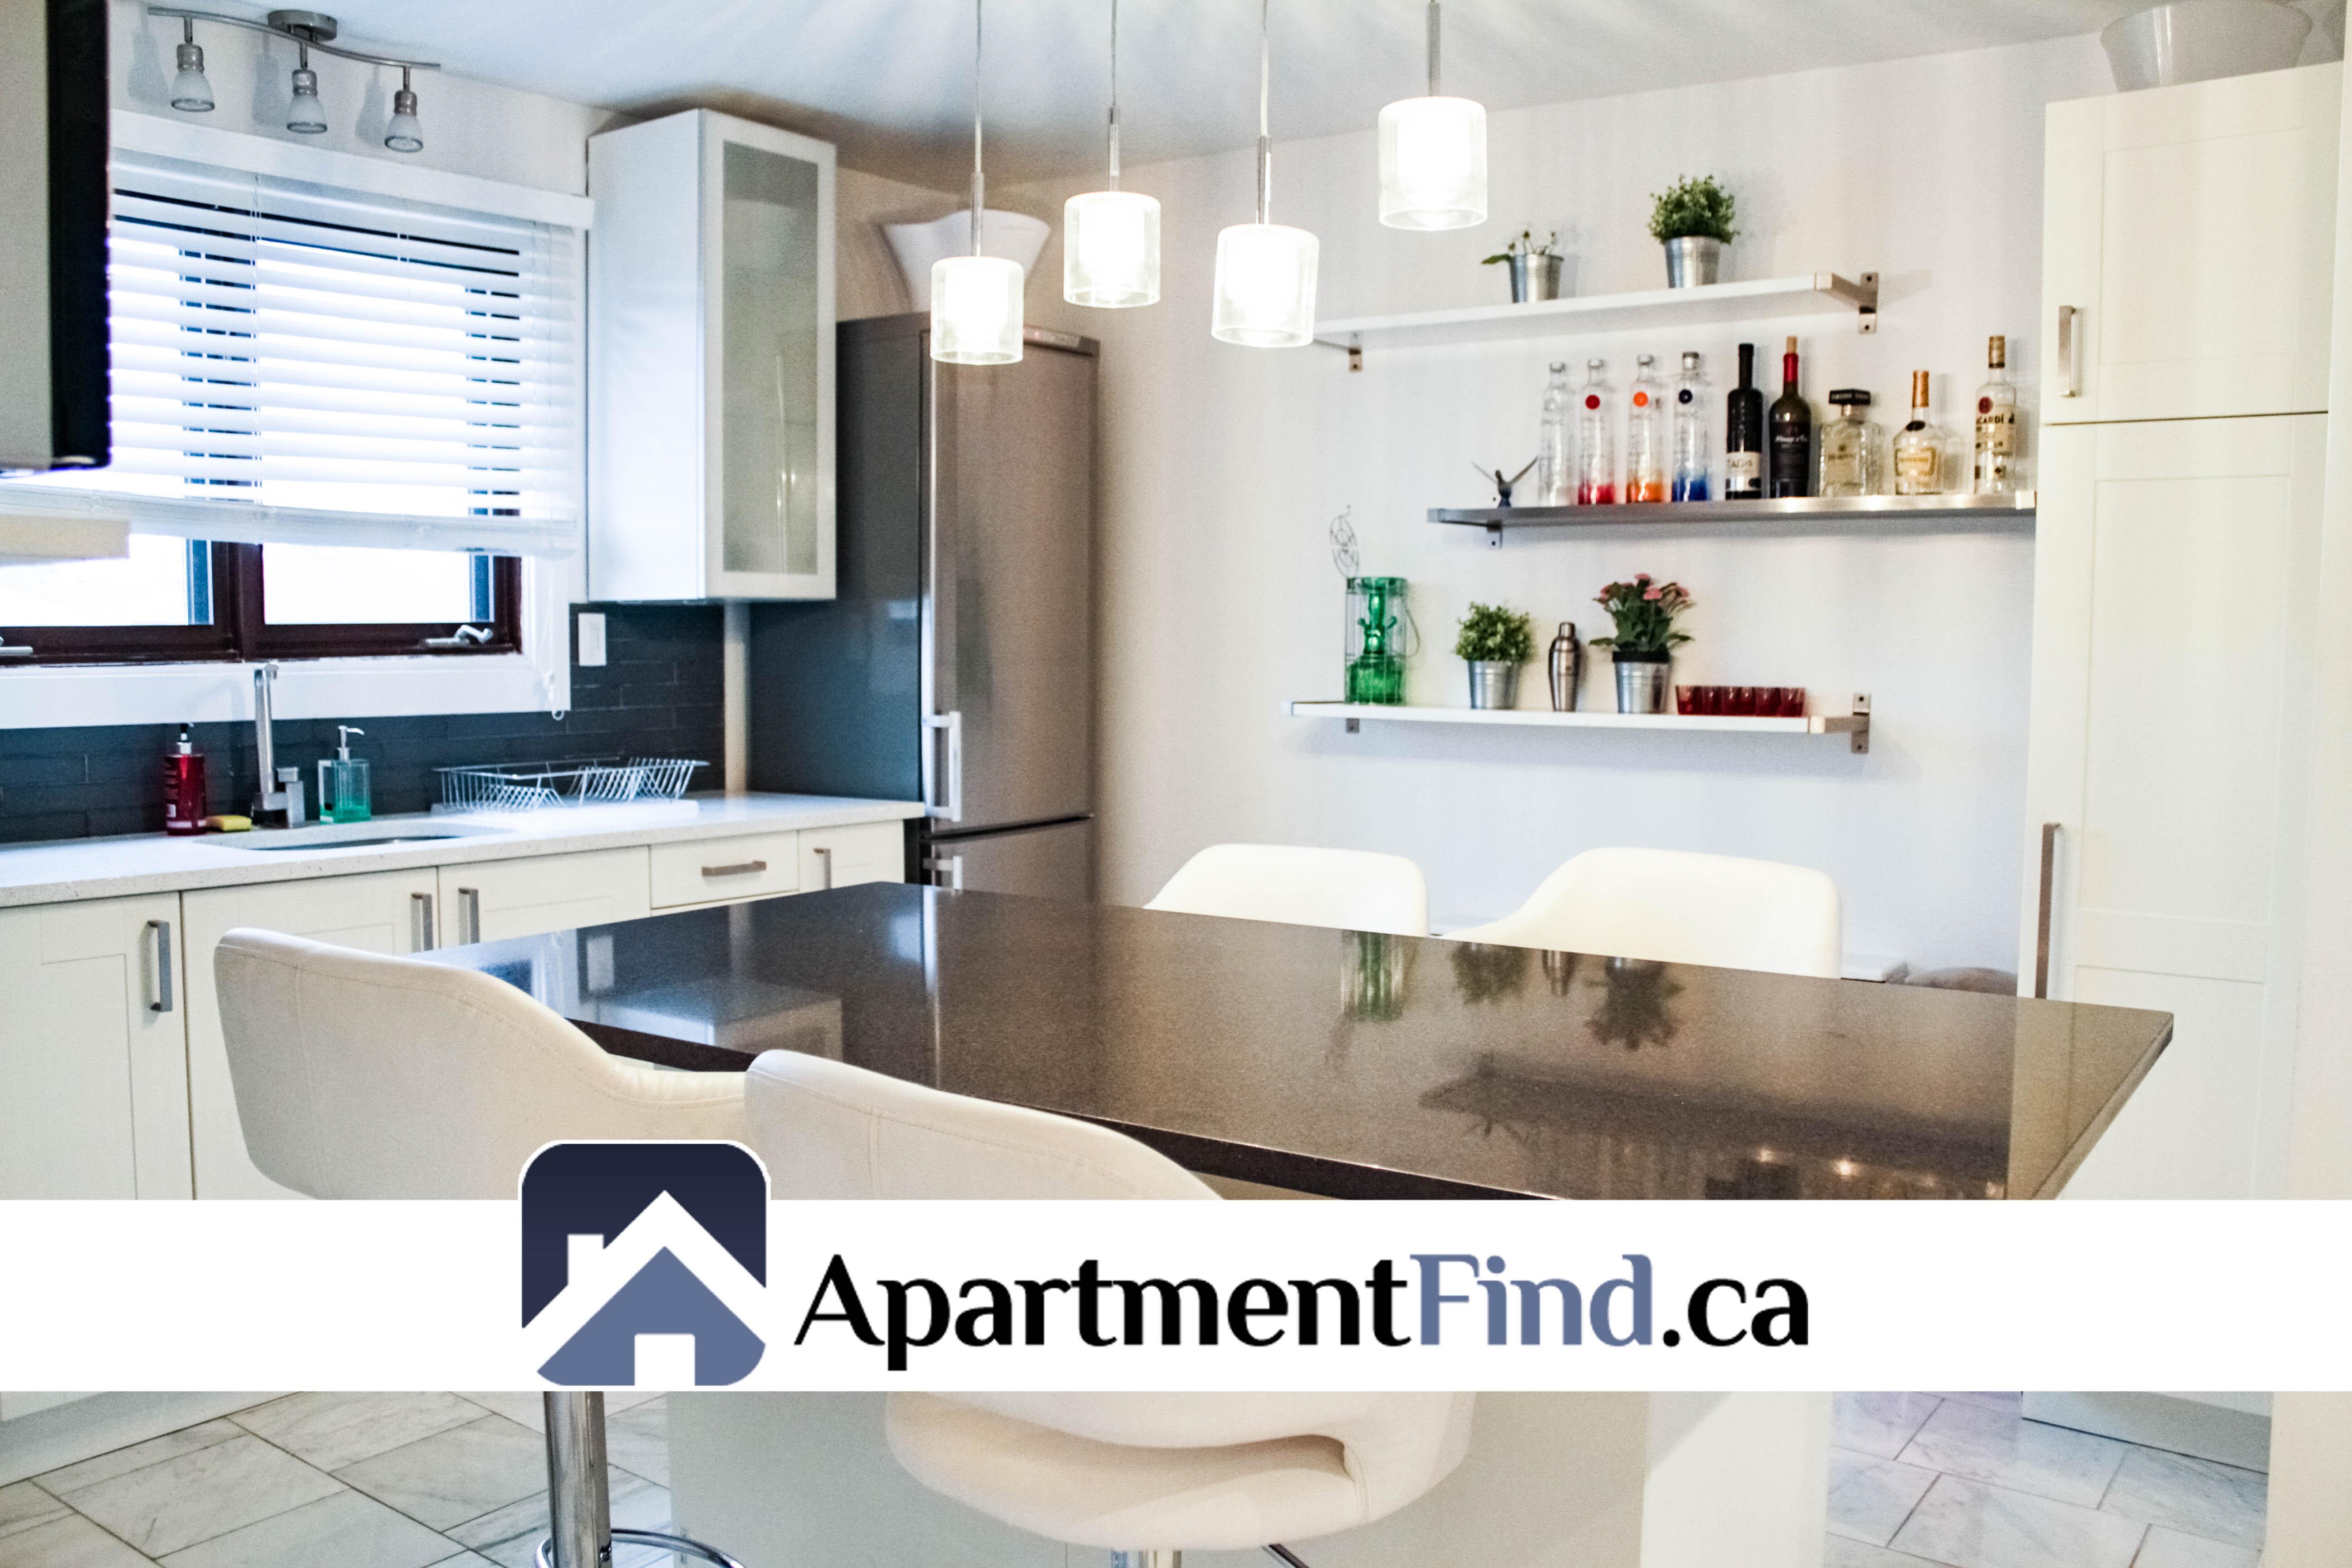 Kitchen of this 2 bedroom apartment ottawa - 198 Lavergne Street